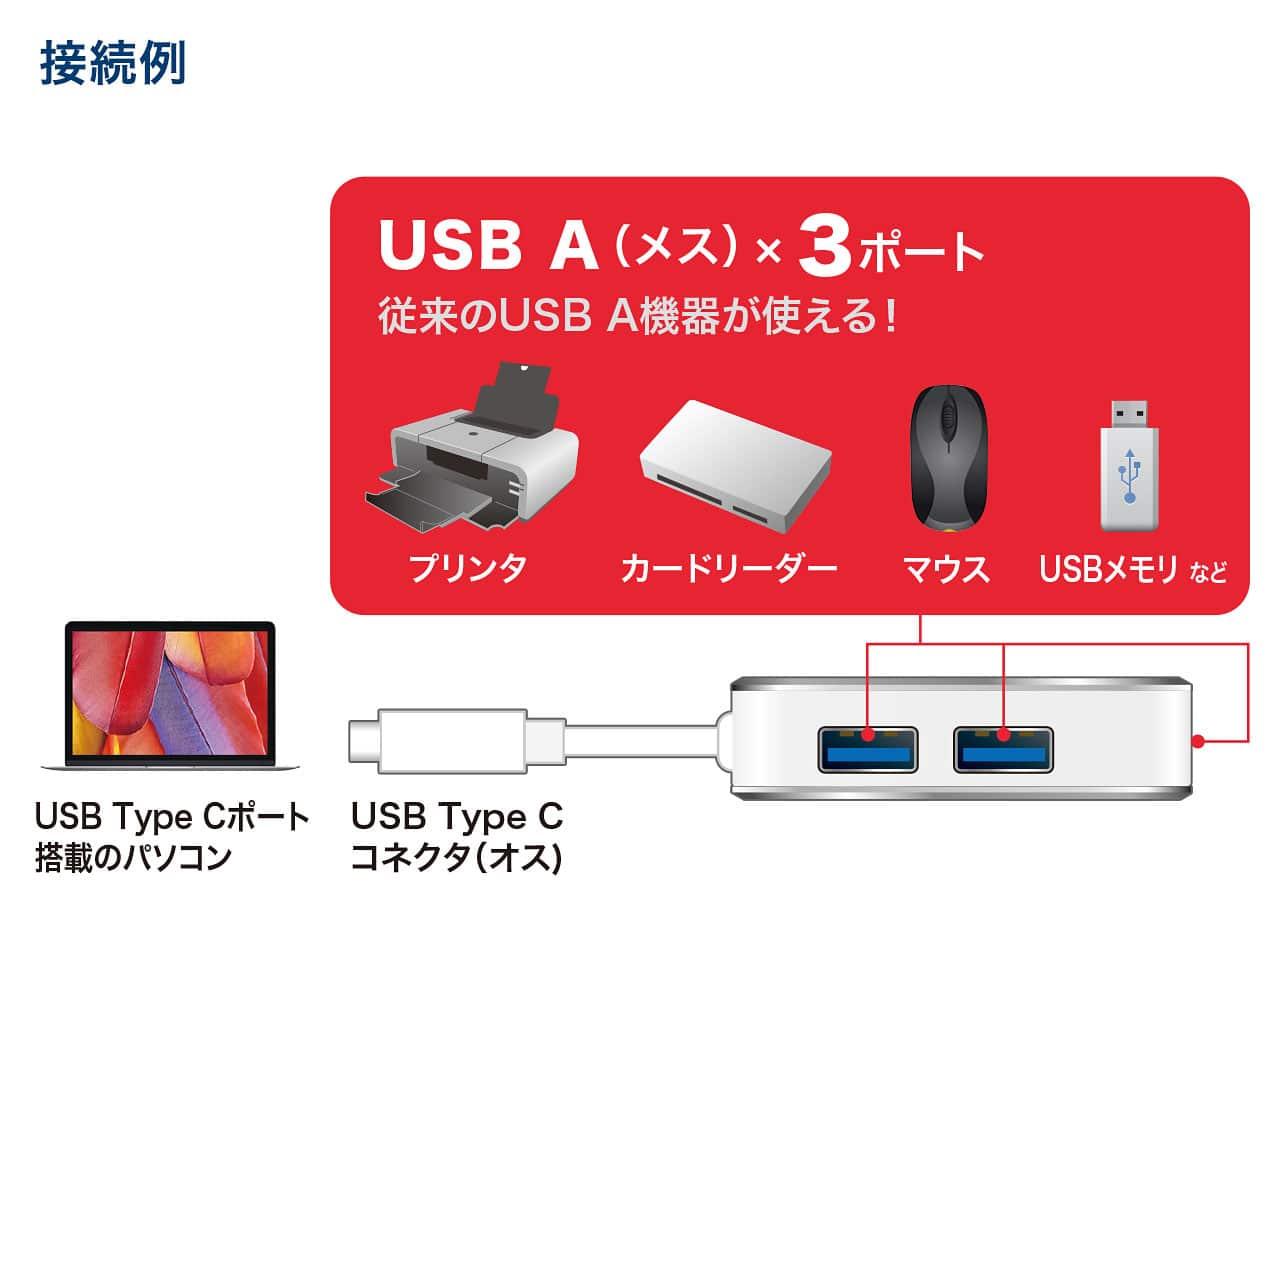 USB Type-C専用 ハブ(USB3.0・3ポート)